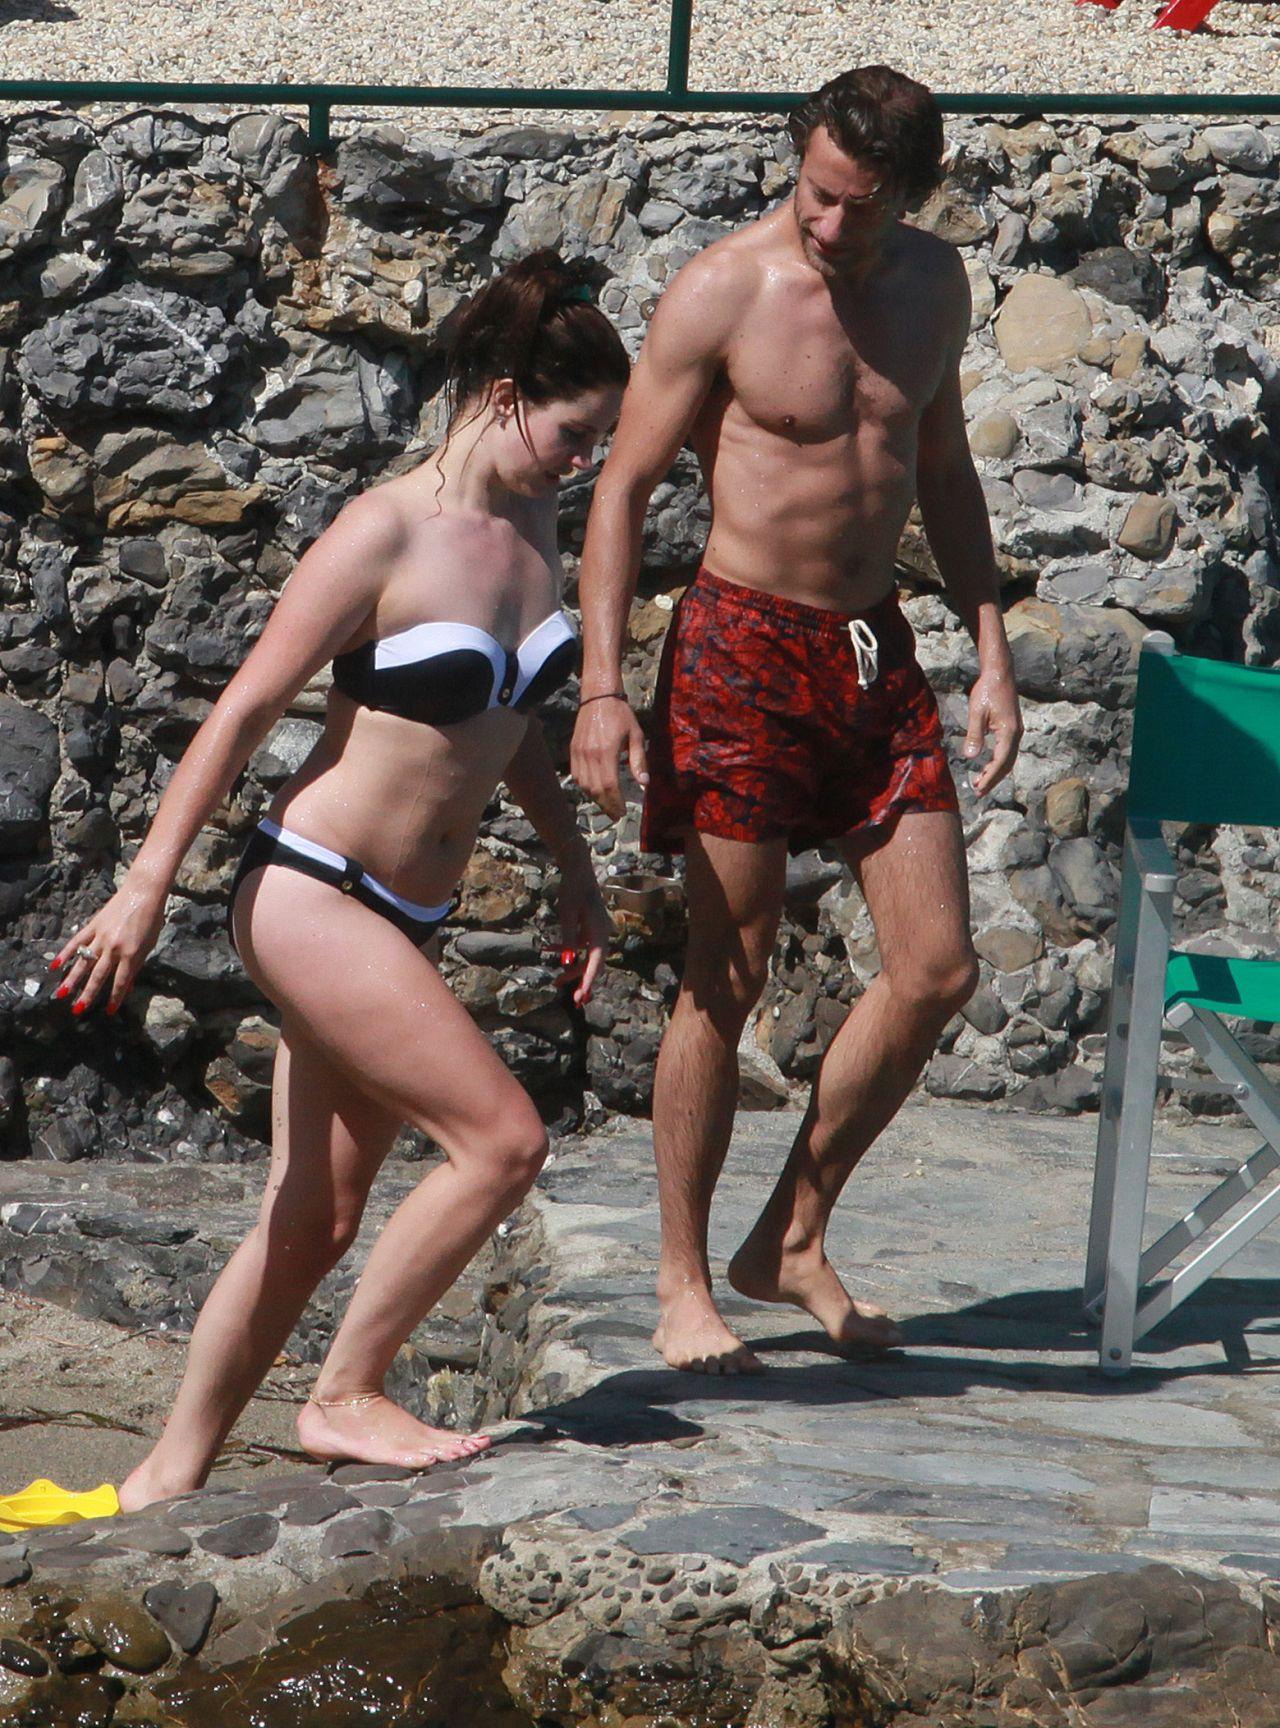 Lana Del Rey Bikini Candids On Vacation In Italy July 2014